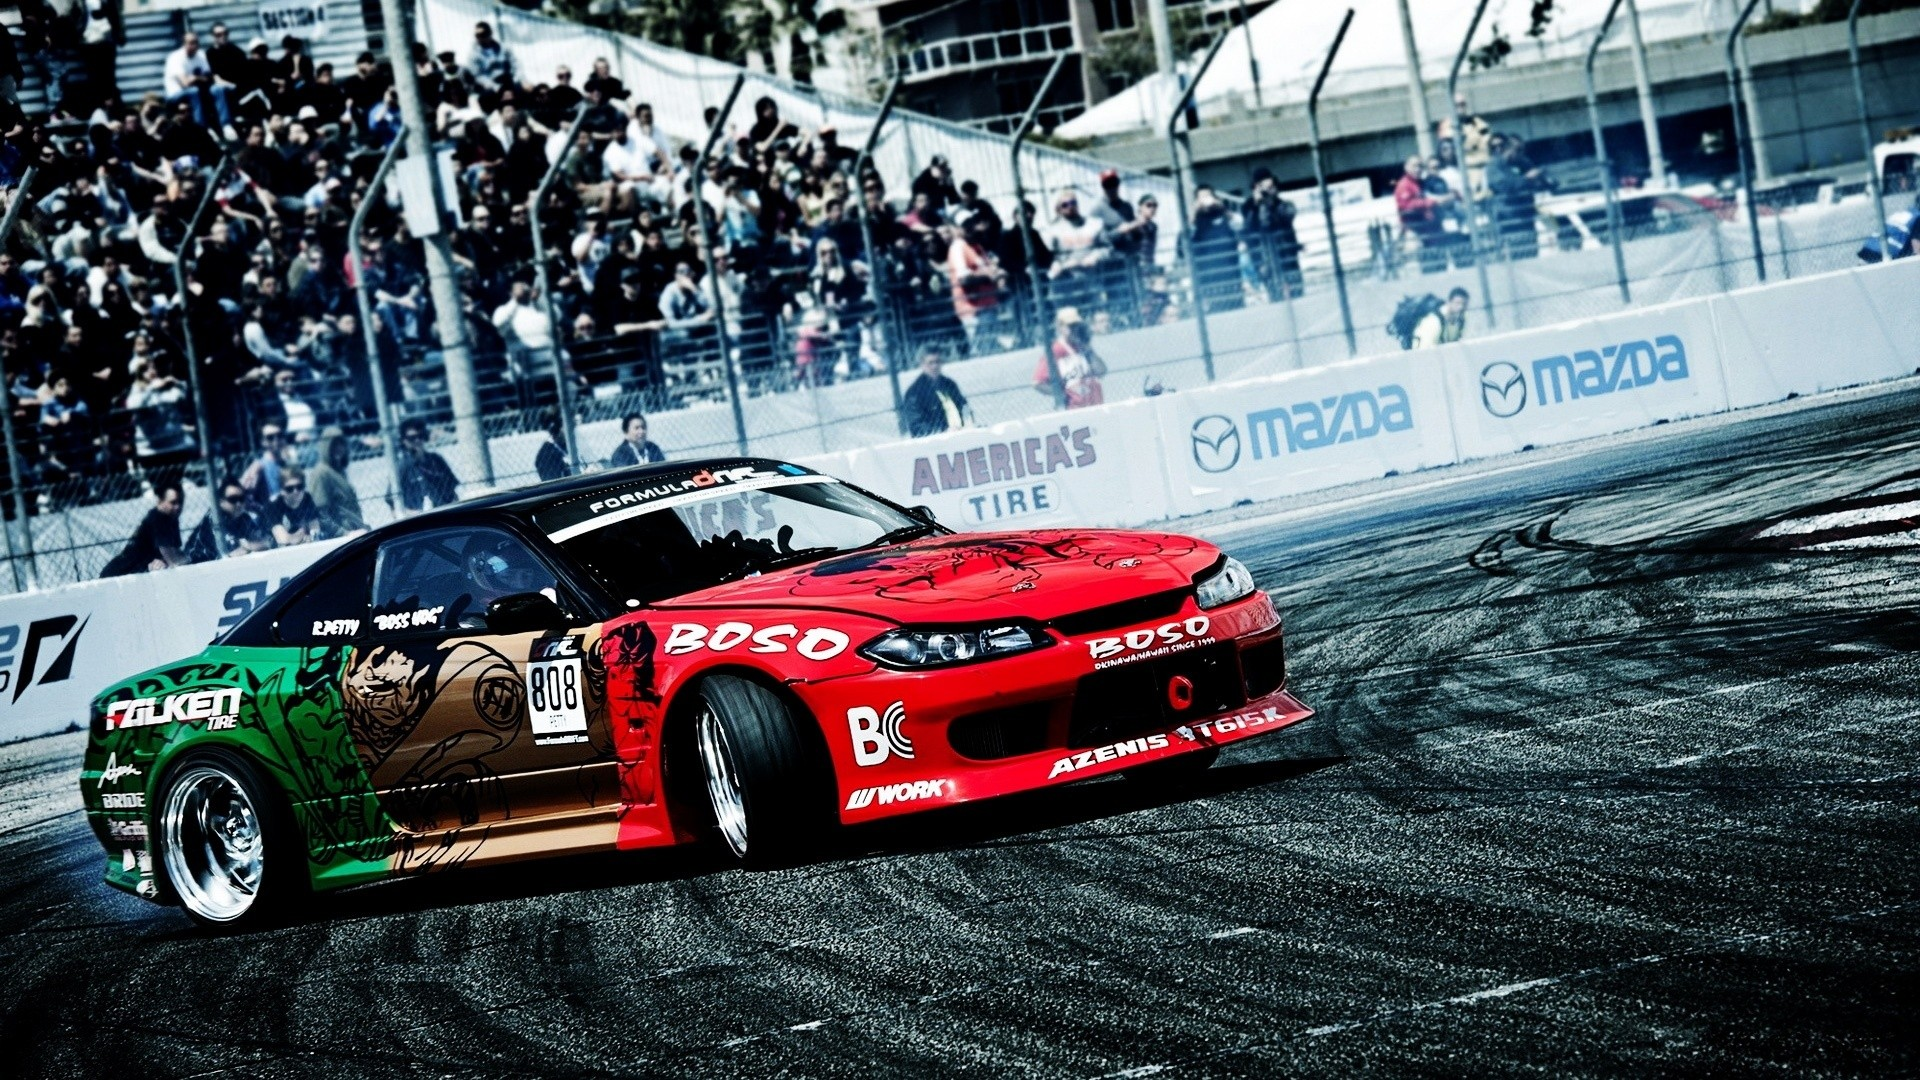 Cars Drift Wallpaper 1920x1080 Cars Drift Nissan Silvia Drifting 1920x1080